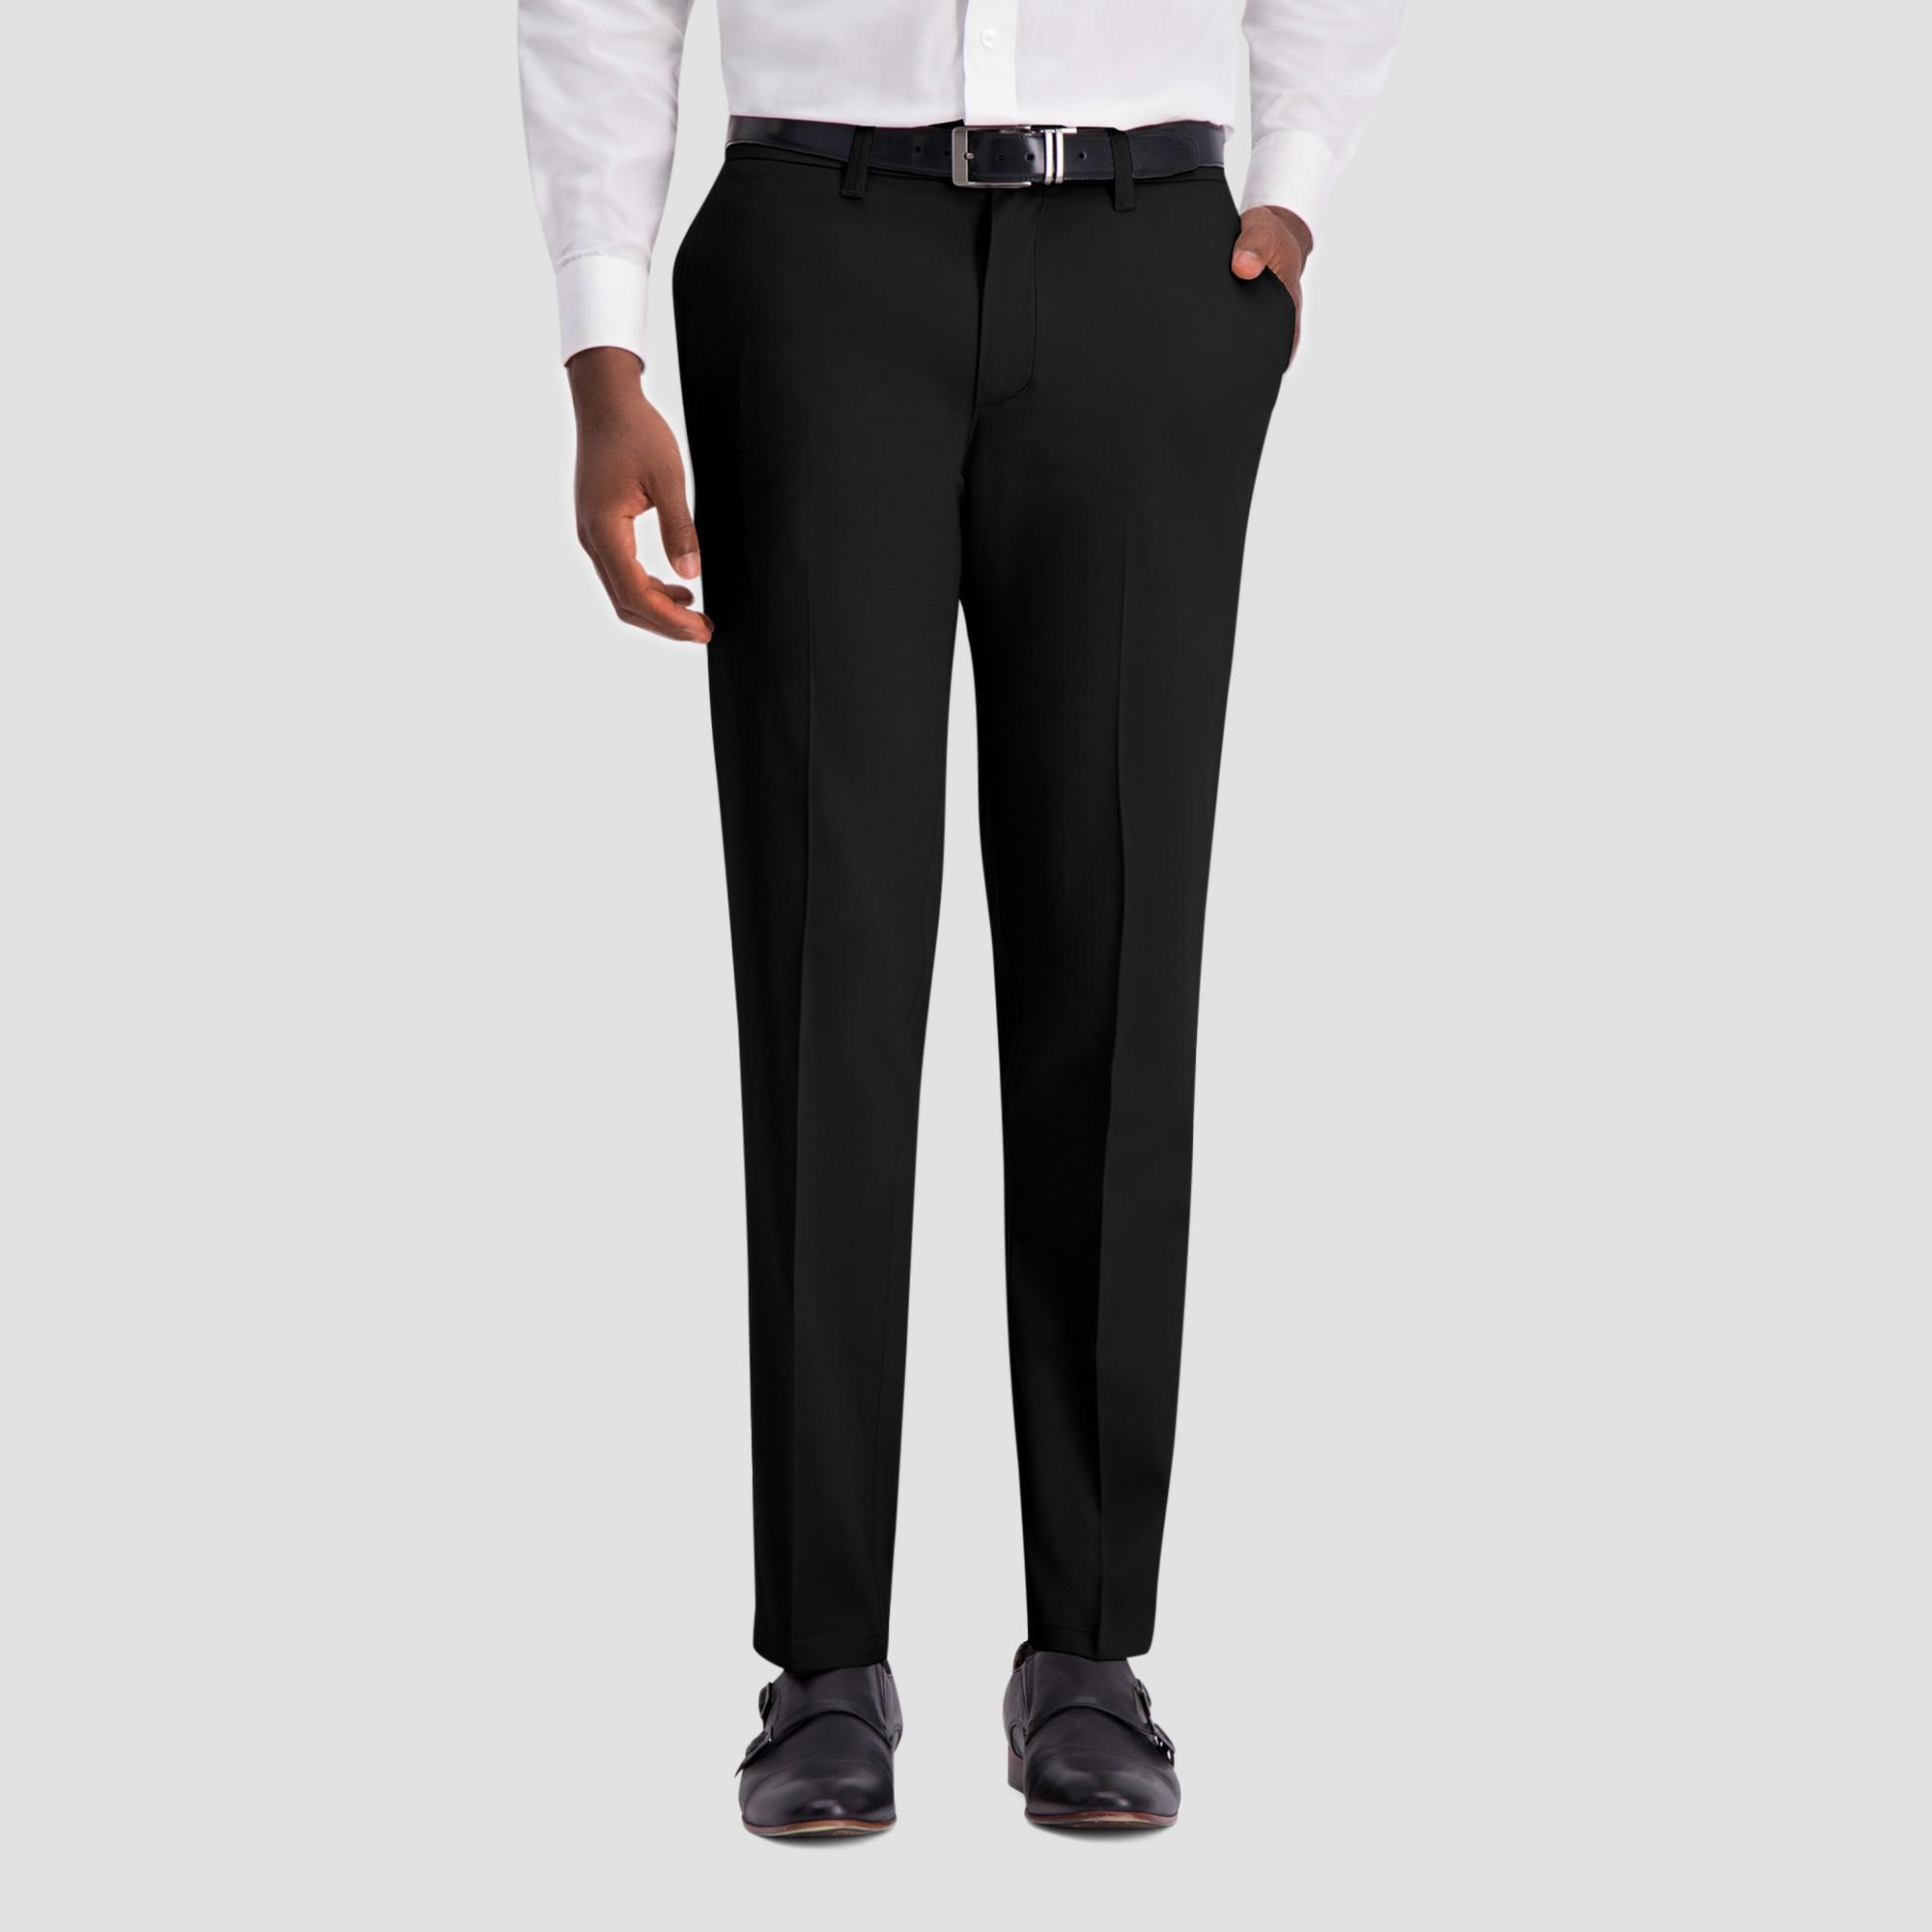 Haggar H26 Men's Slim Fit No Iron Stretch Trousers - Black 28x30